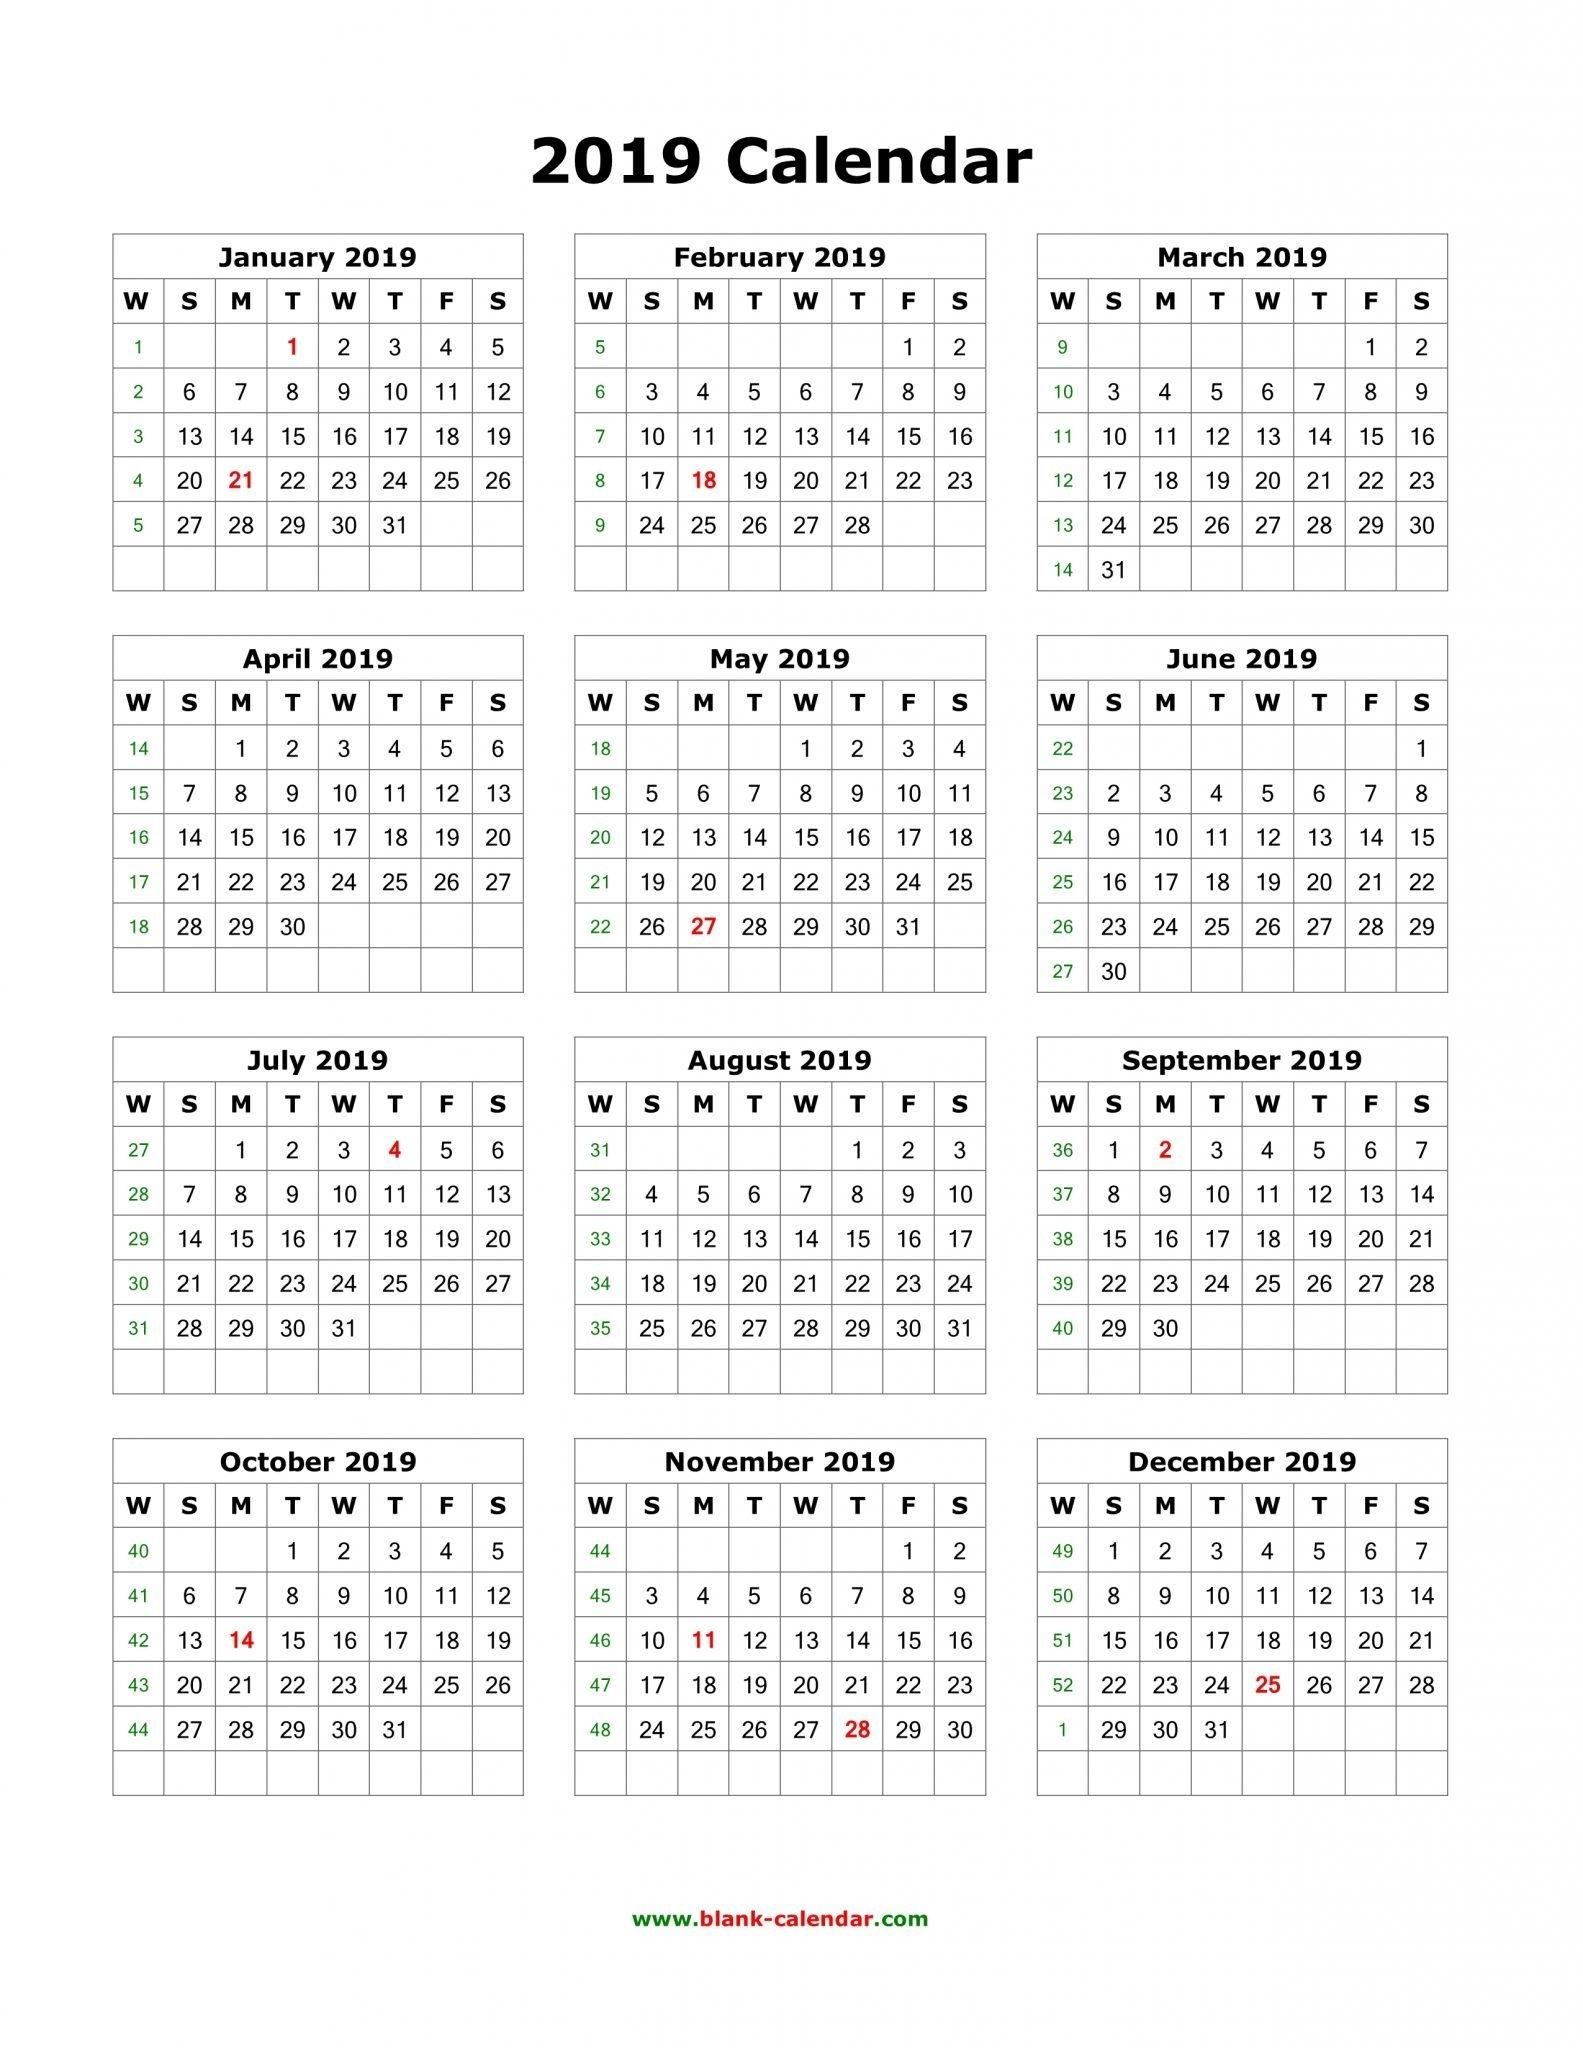 Download Blank 2019 Calendar Templates | 12 Month Calendar In One 5 Month Calendar Template